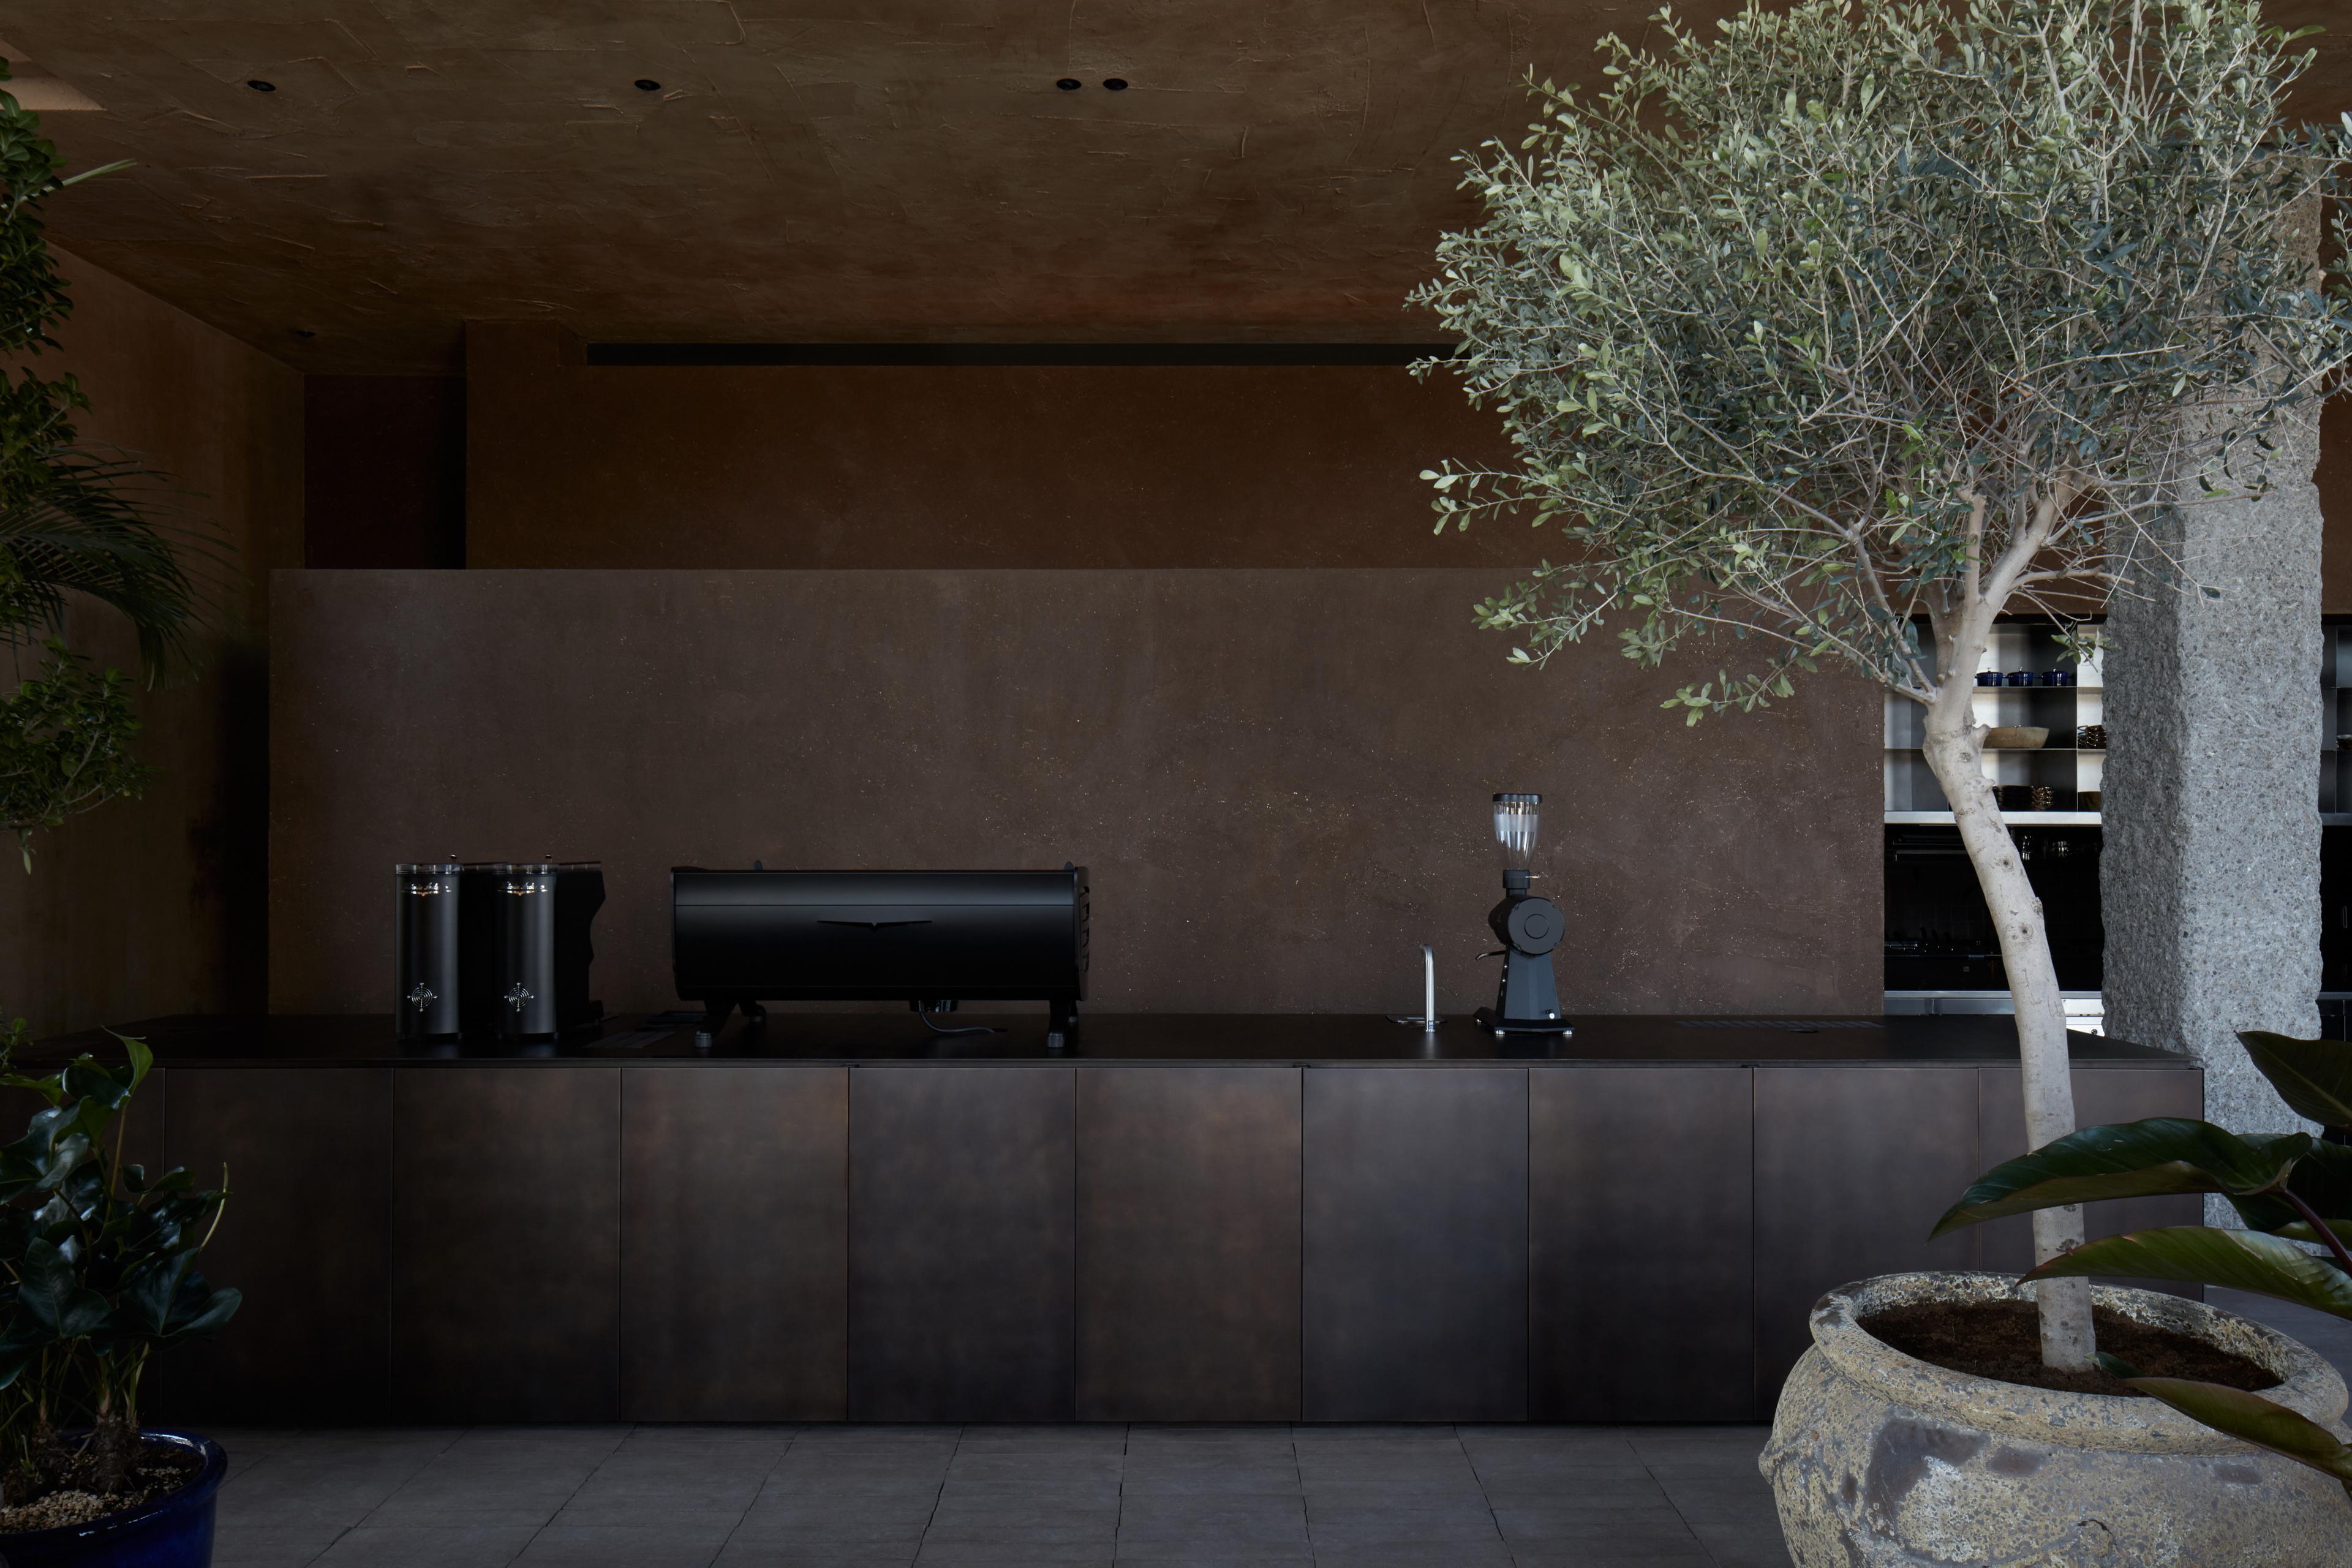 Terra Eatery restaurant Dubai by Bone Studio, photo by Oculis Project